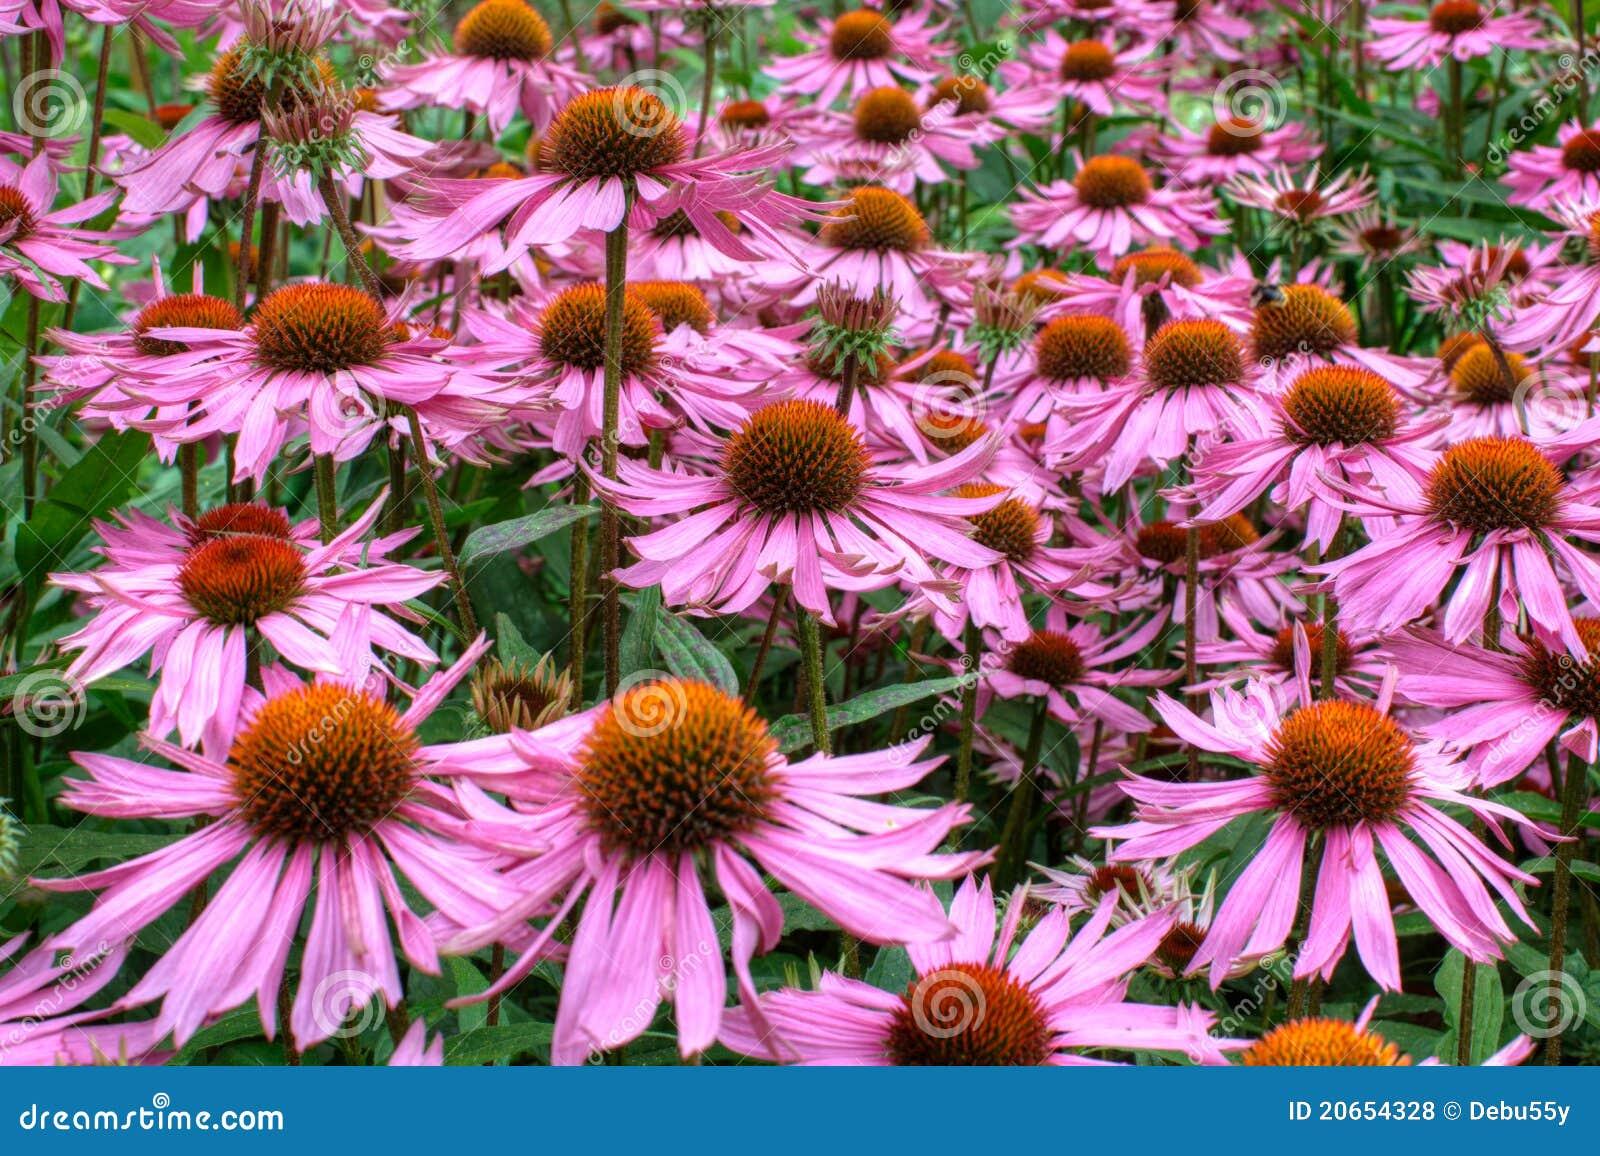 Large daisy-like cone flowers.